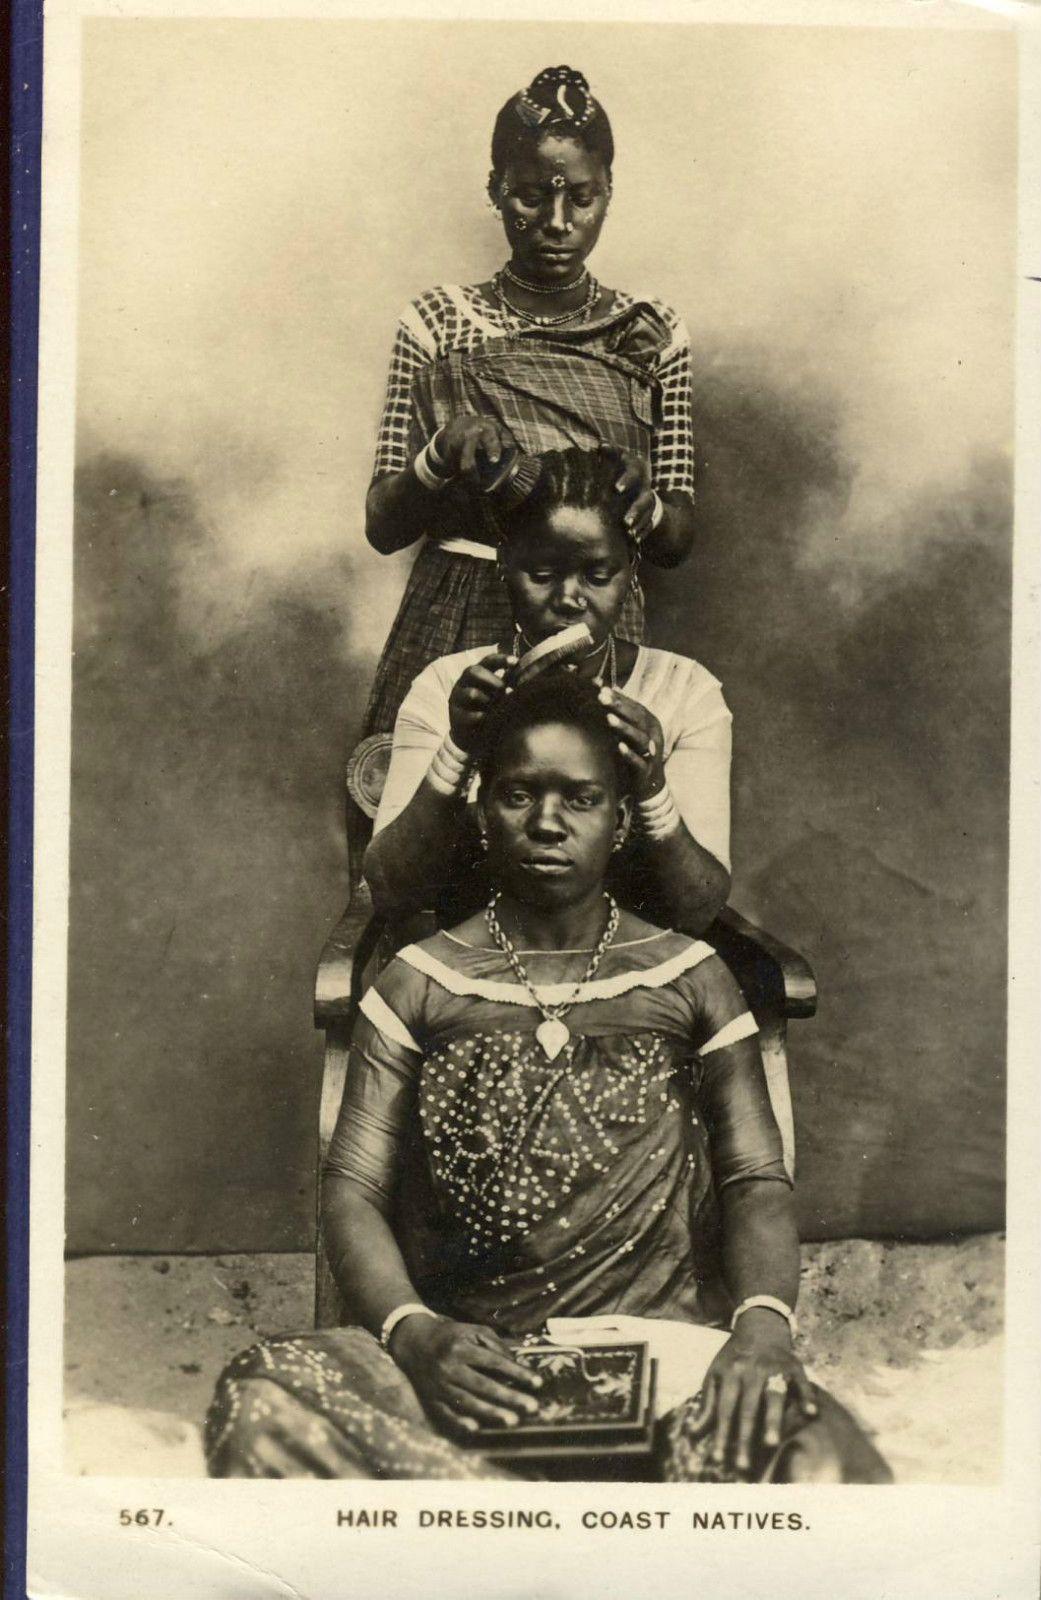 girls hair dressing mombasa 1930s - some things never change